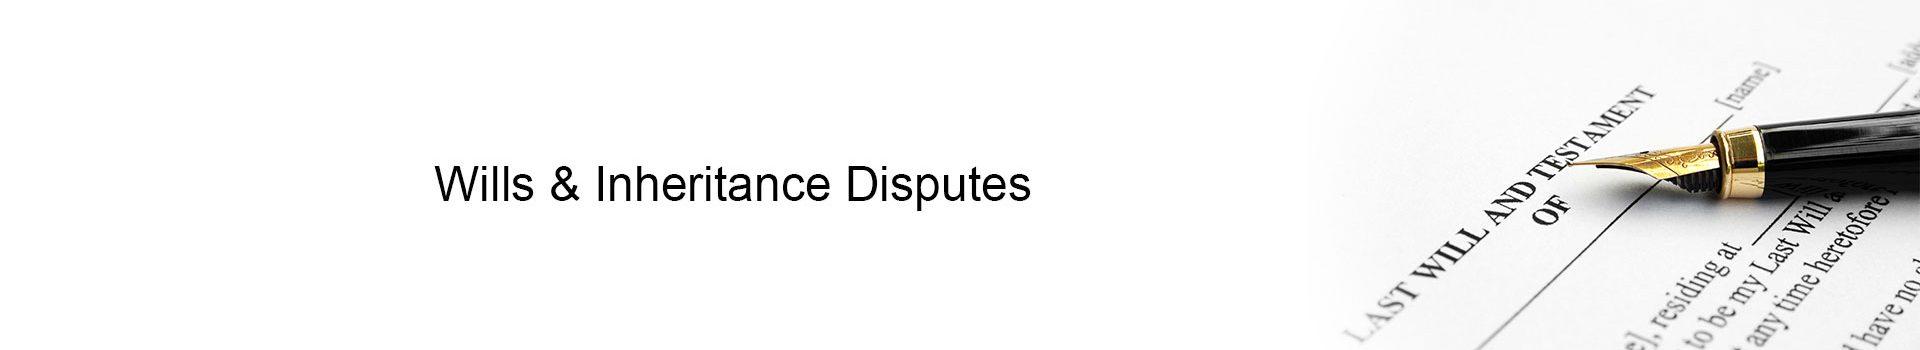 Wills-and-Inheritance-Disputes2